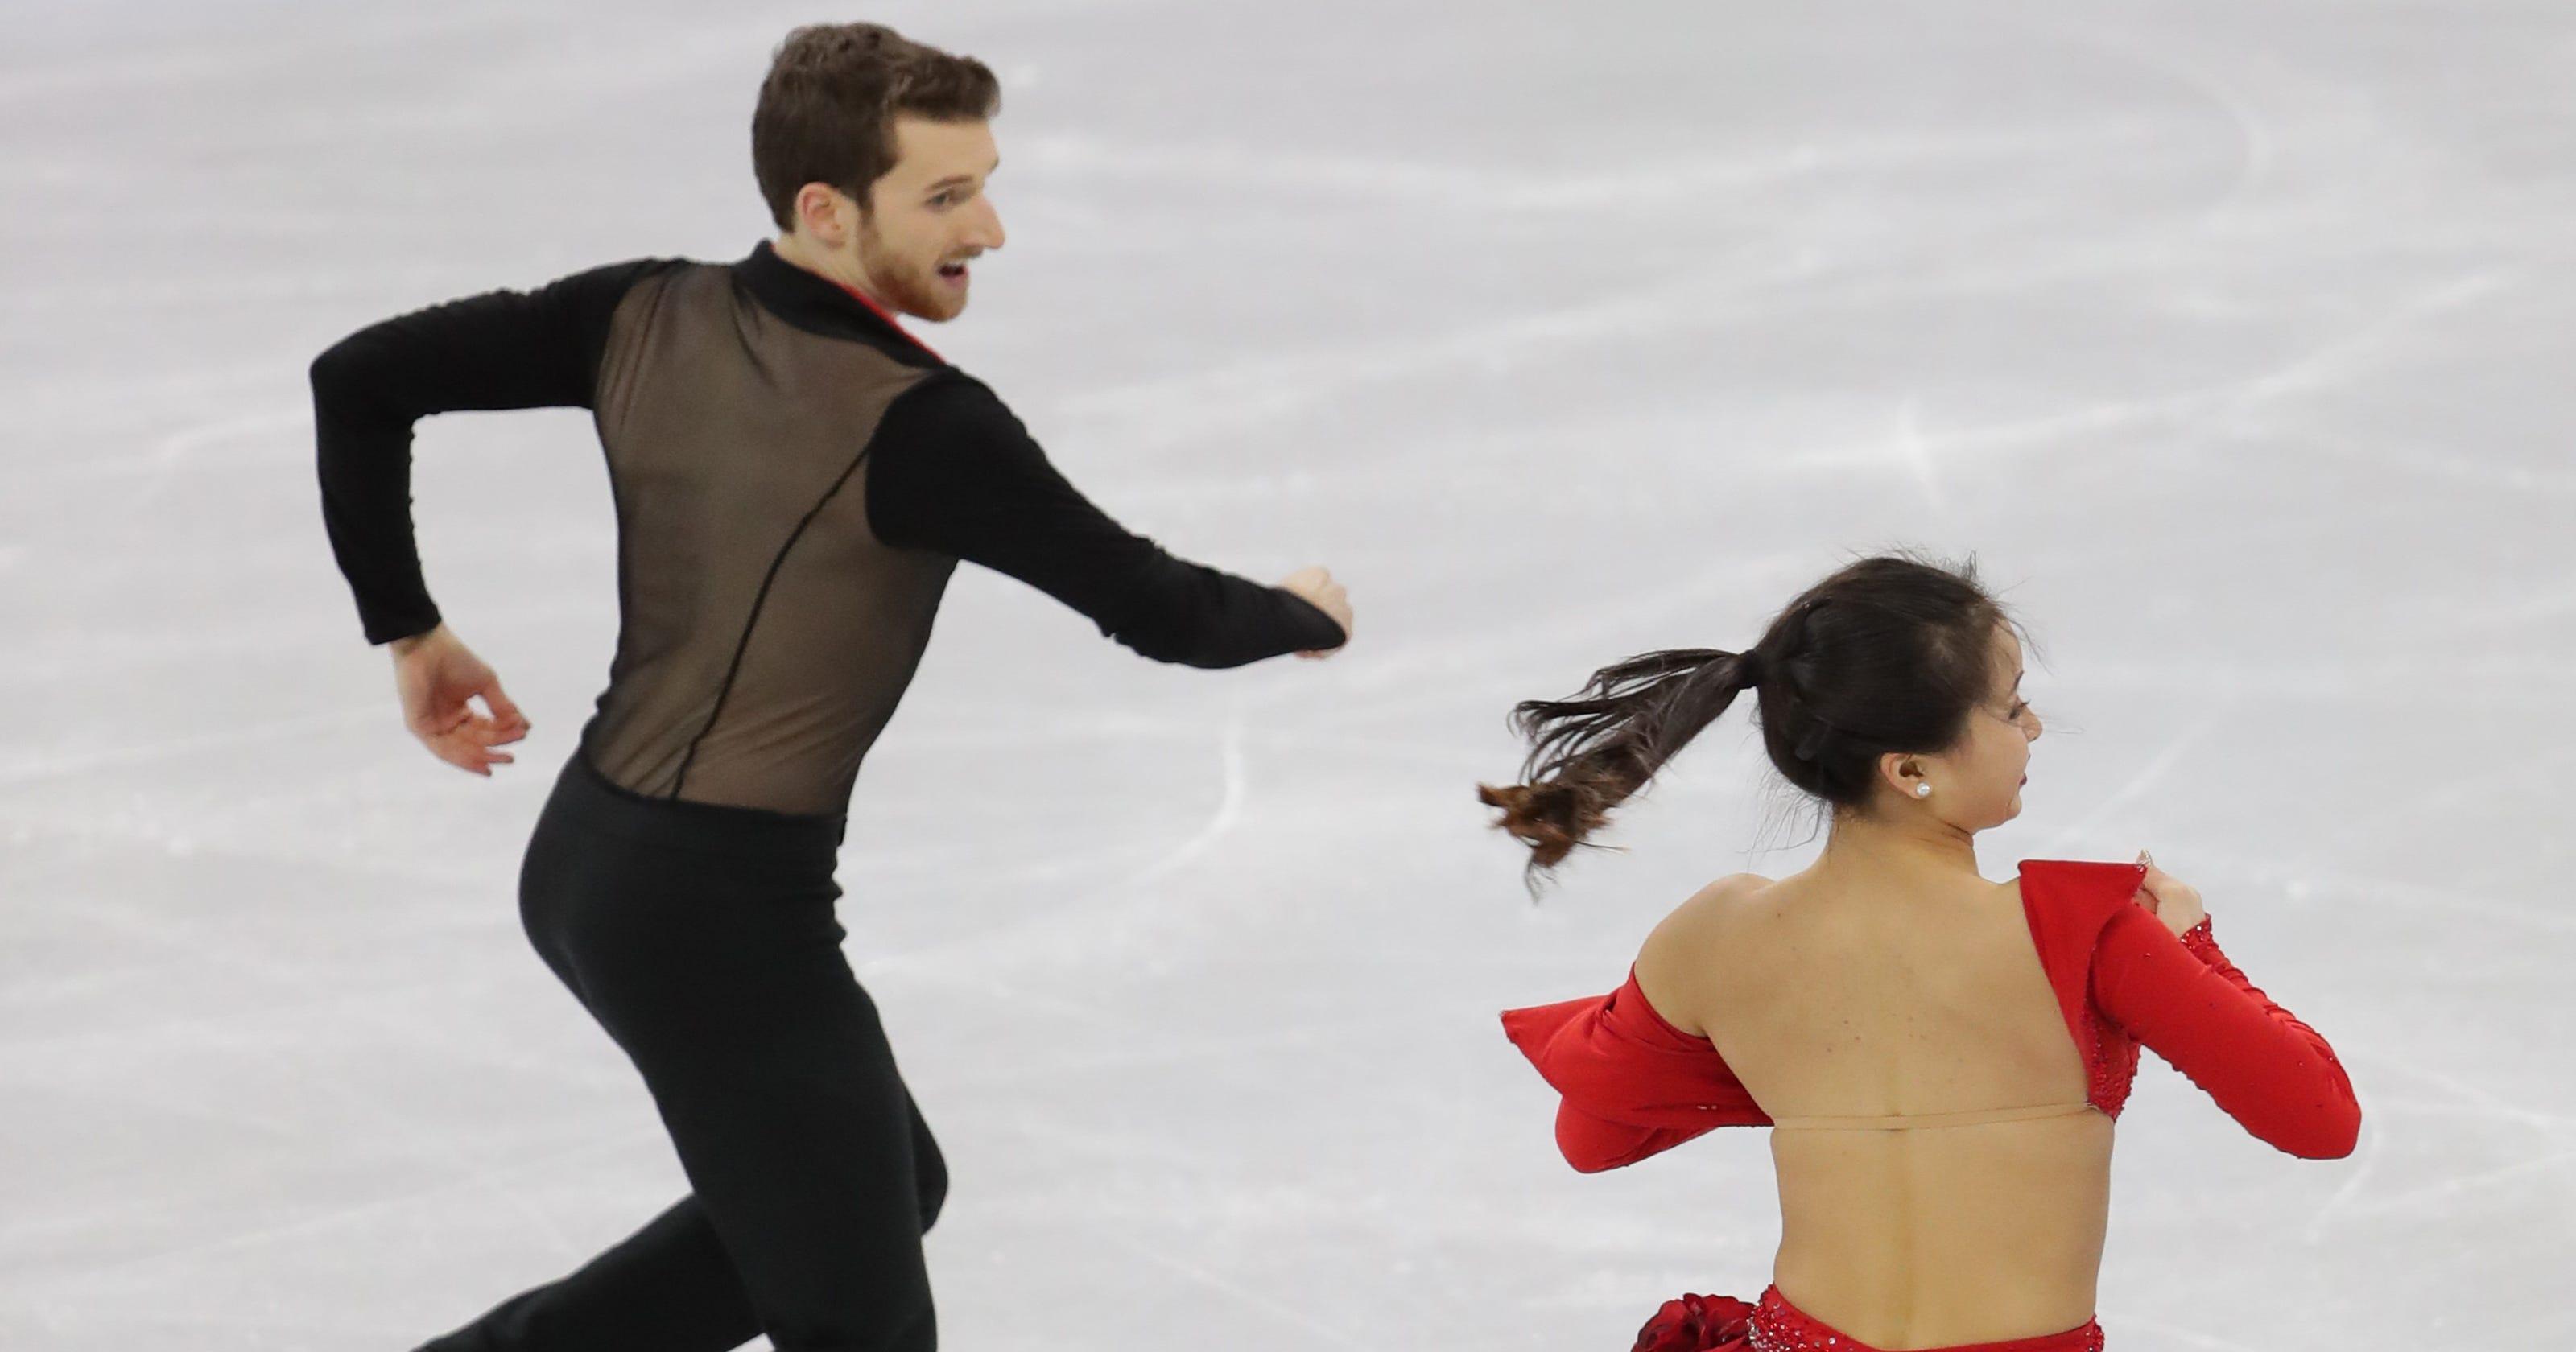 Winter Olympics Yura Min S Costume Malfunction Nearly